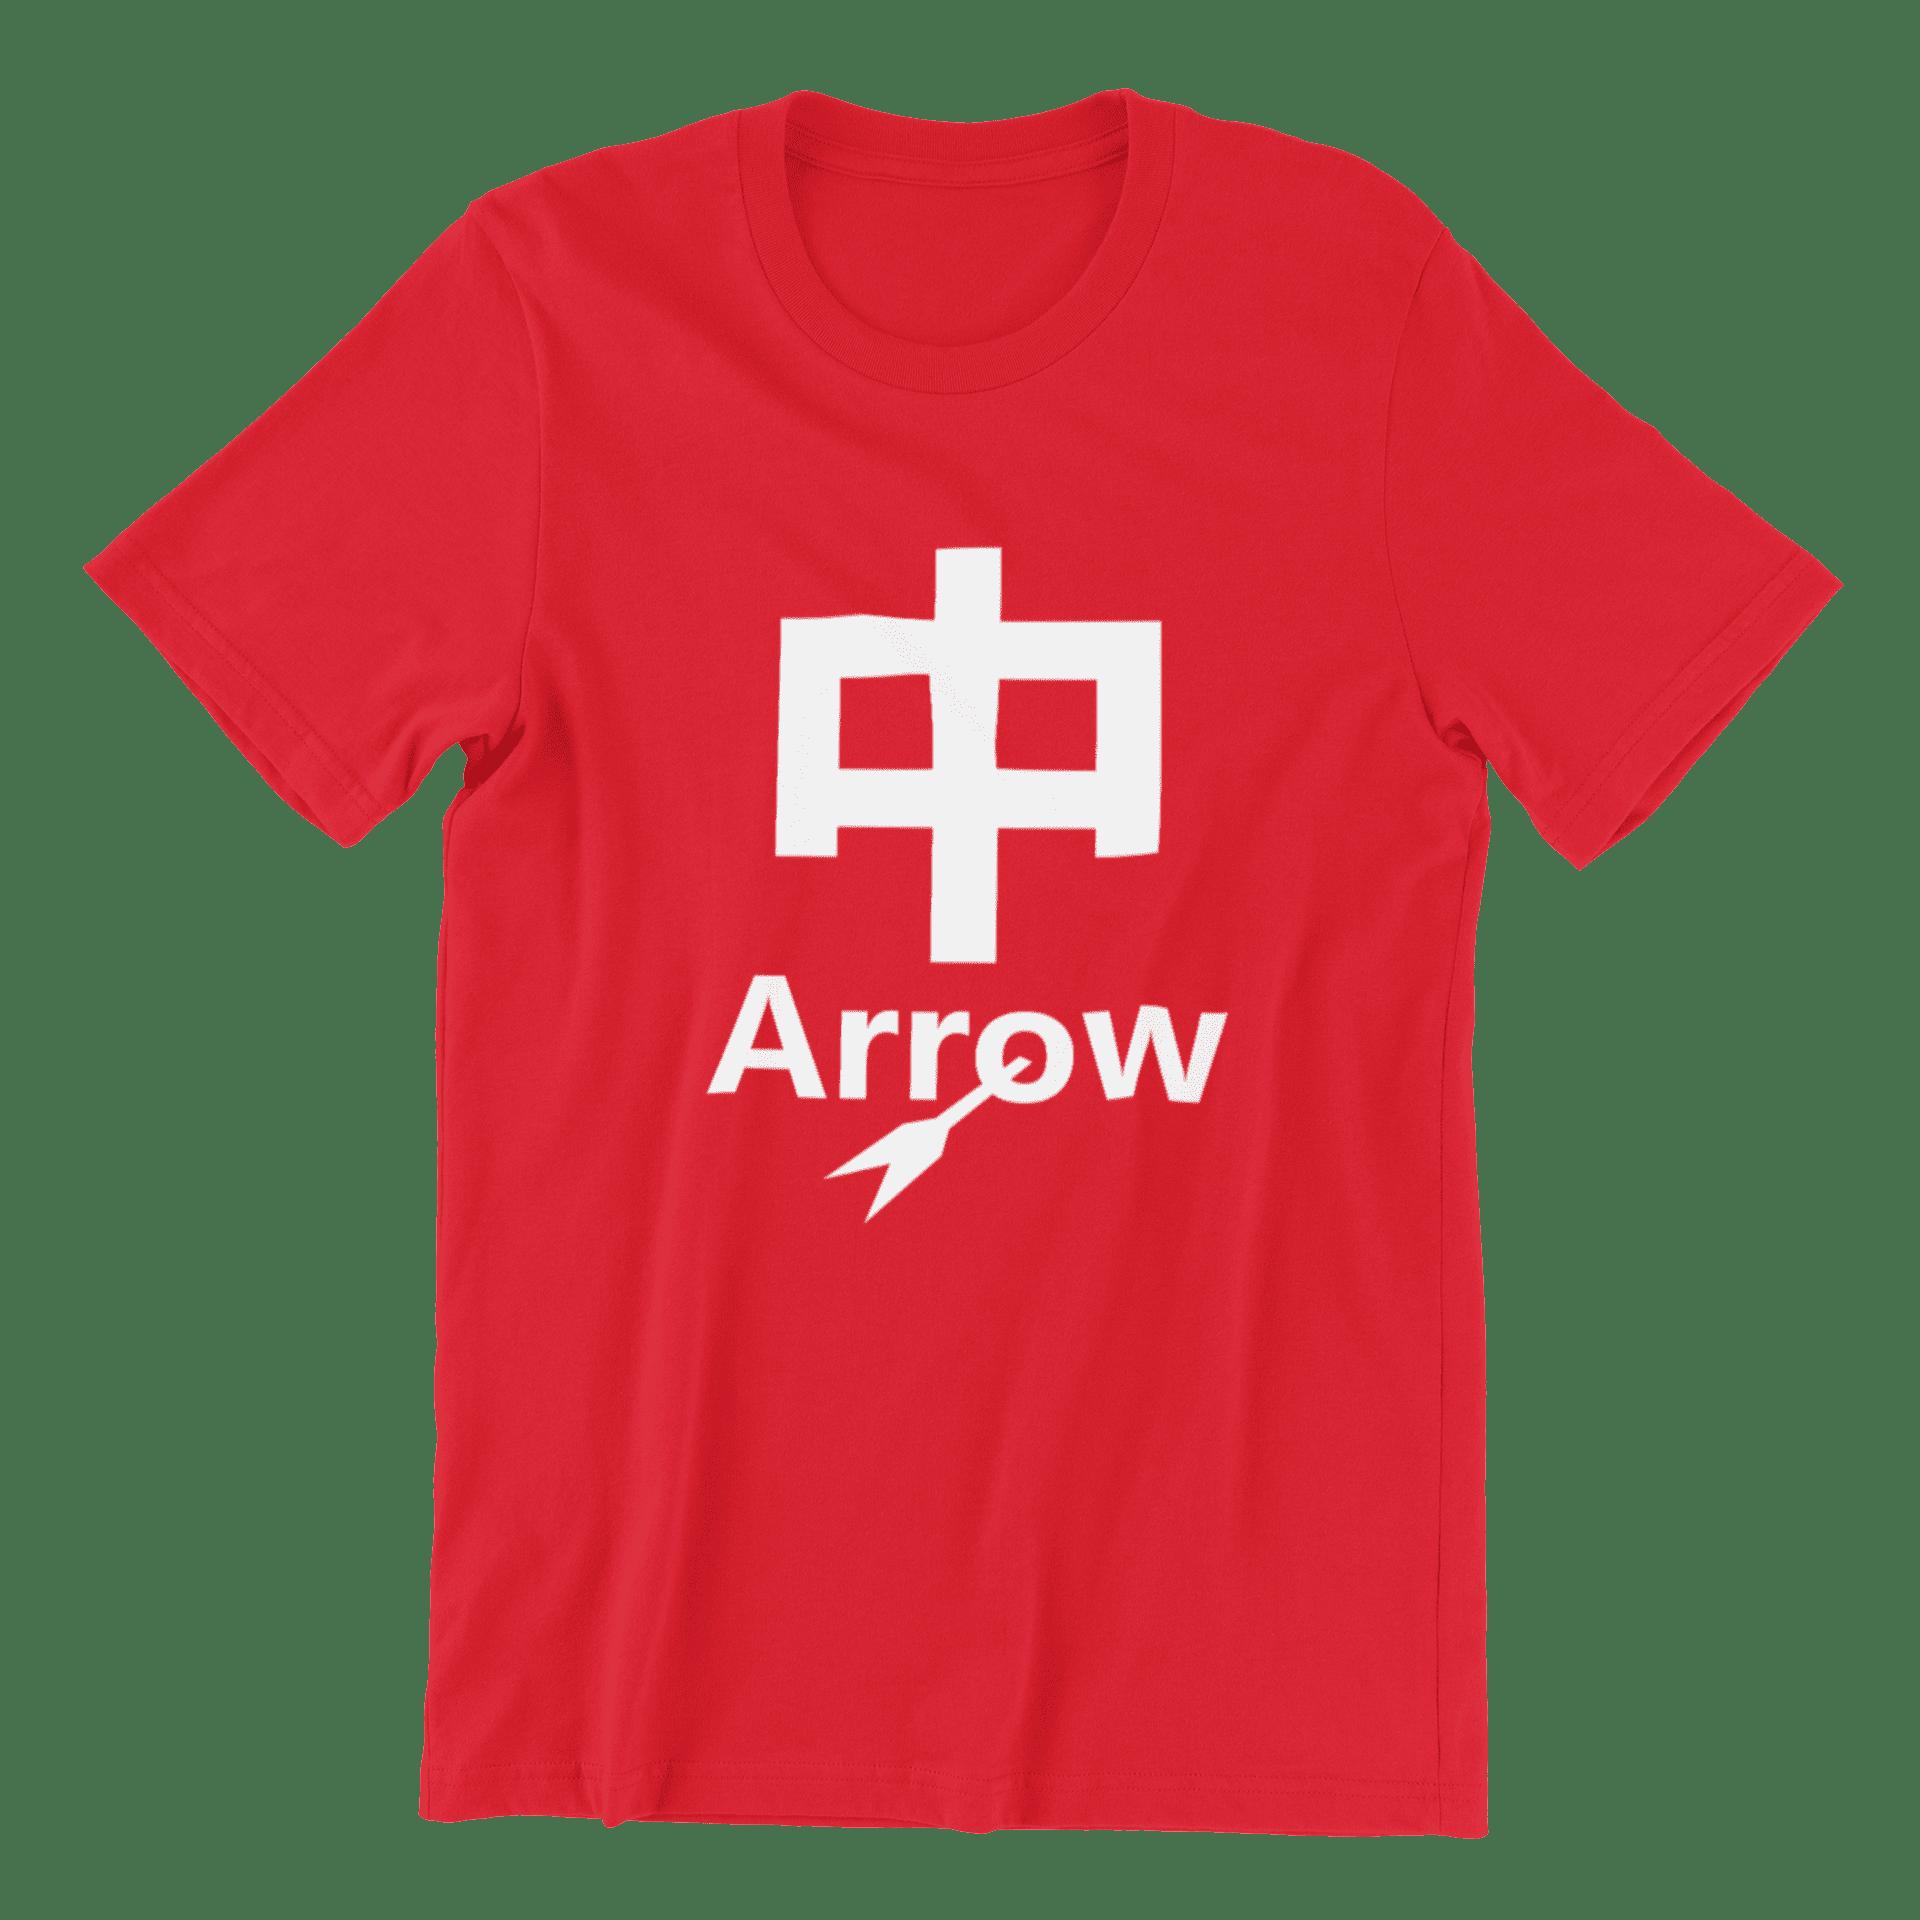 Dio Arrow Crew Neck S-Sleeve T-shirt